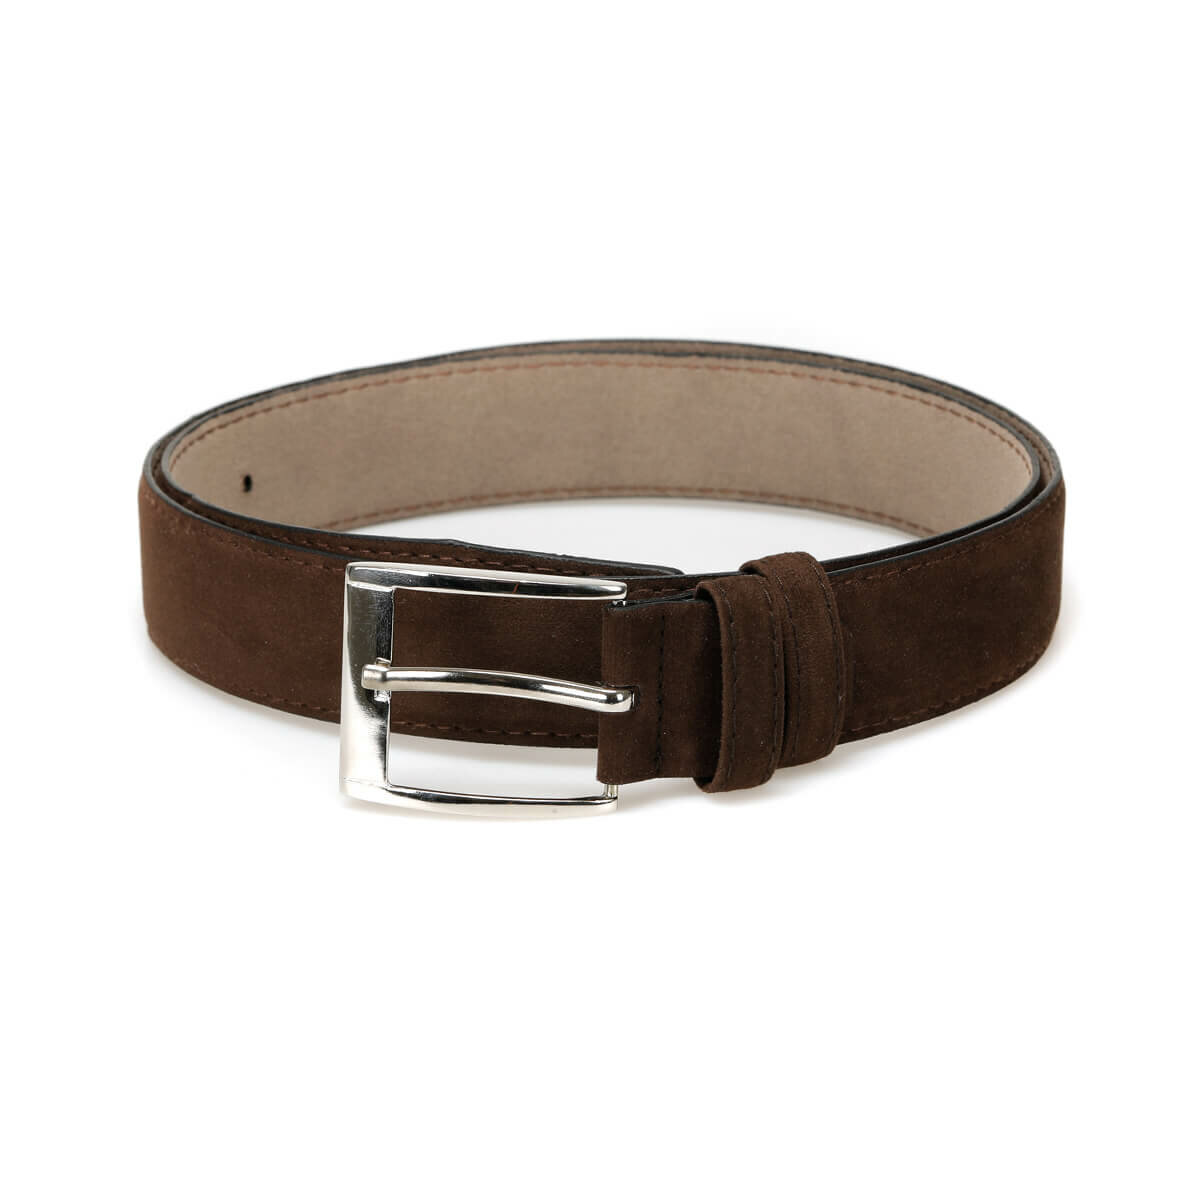 FLO MRAS3512 Brown Men 'S Belt Garamond